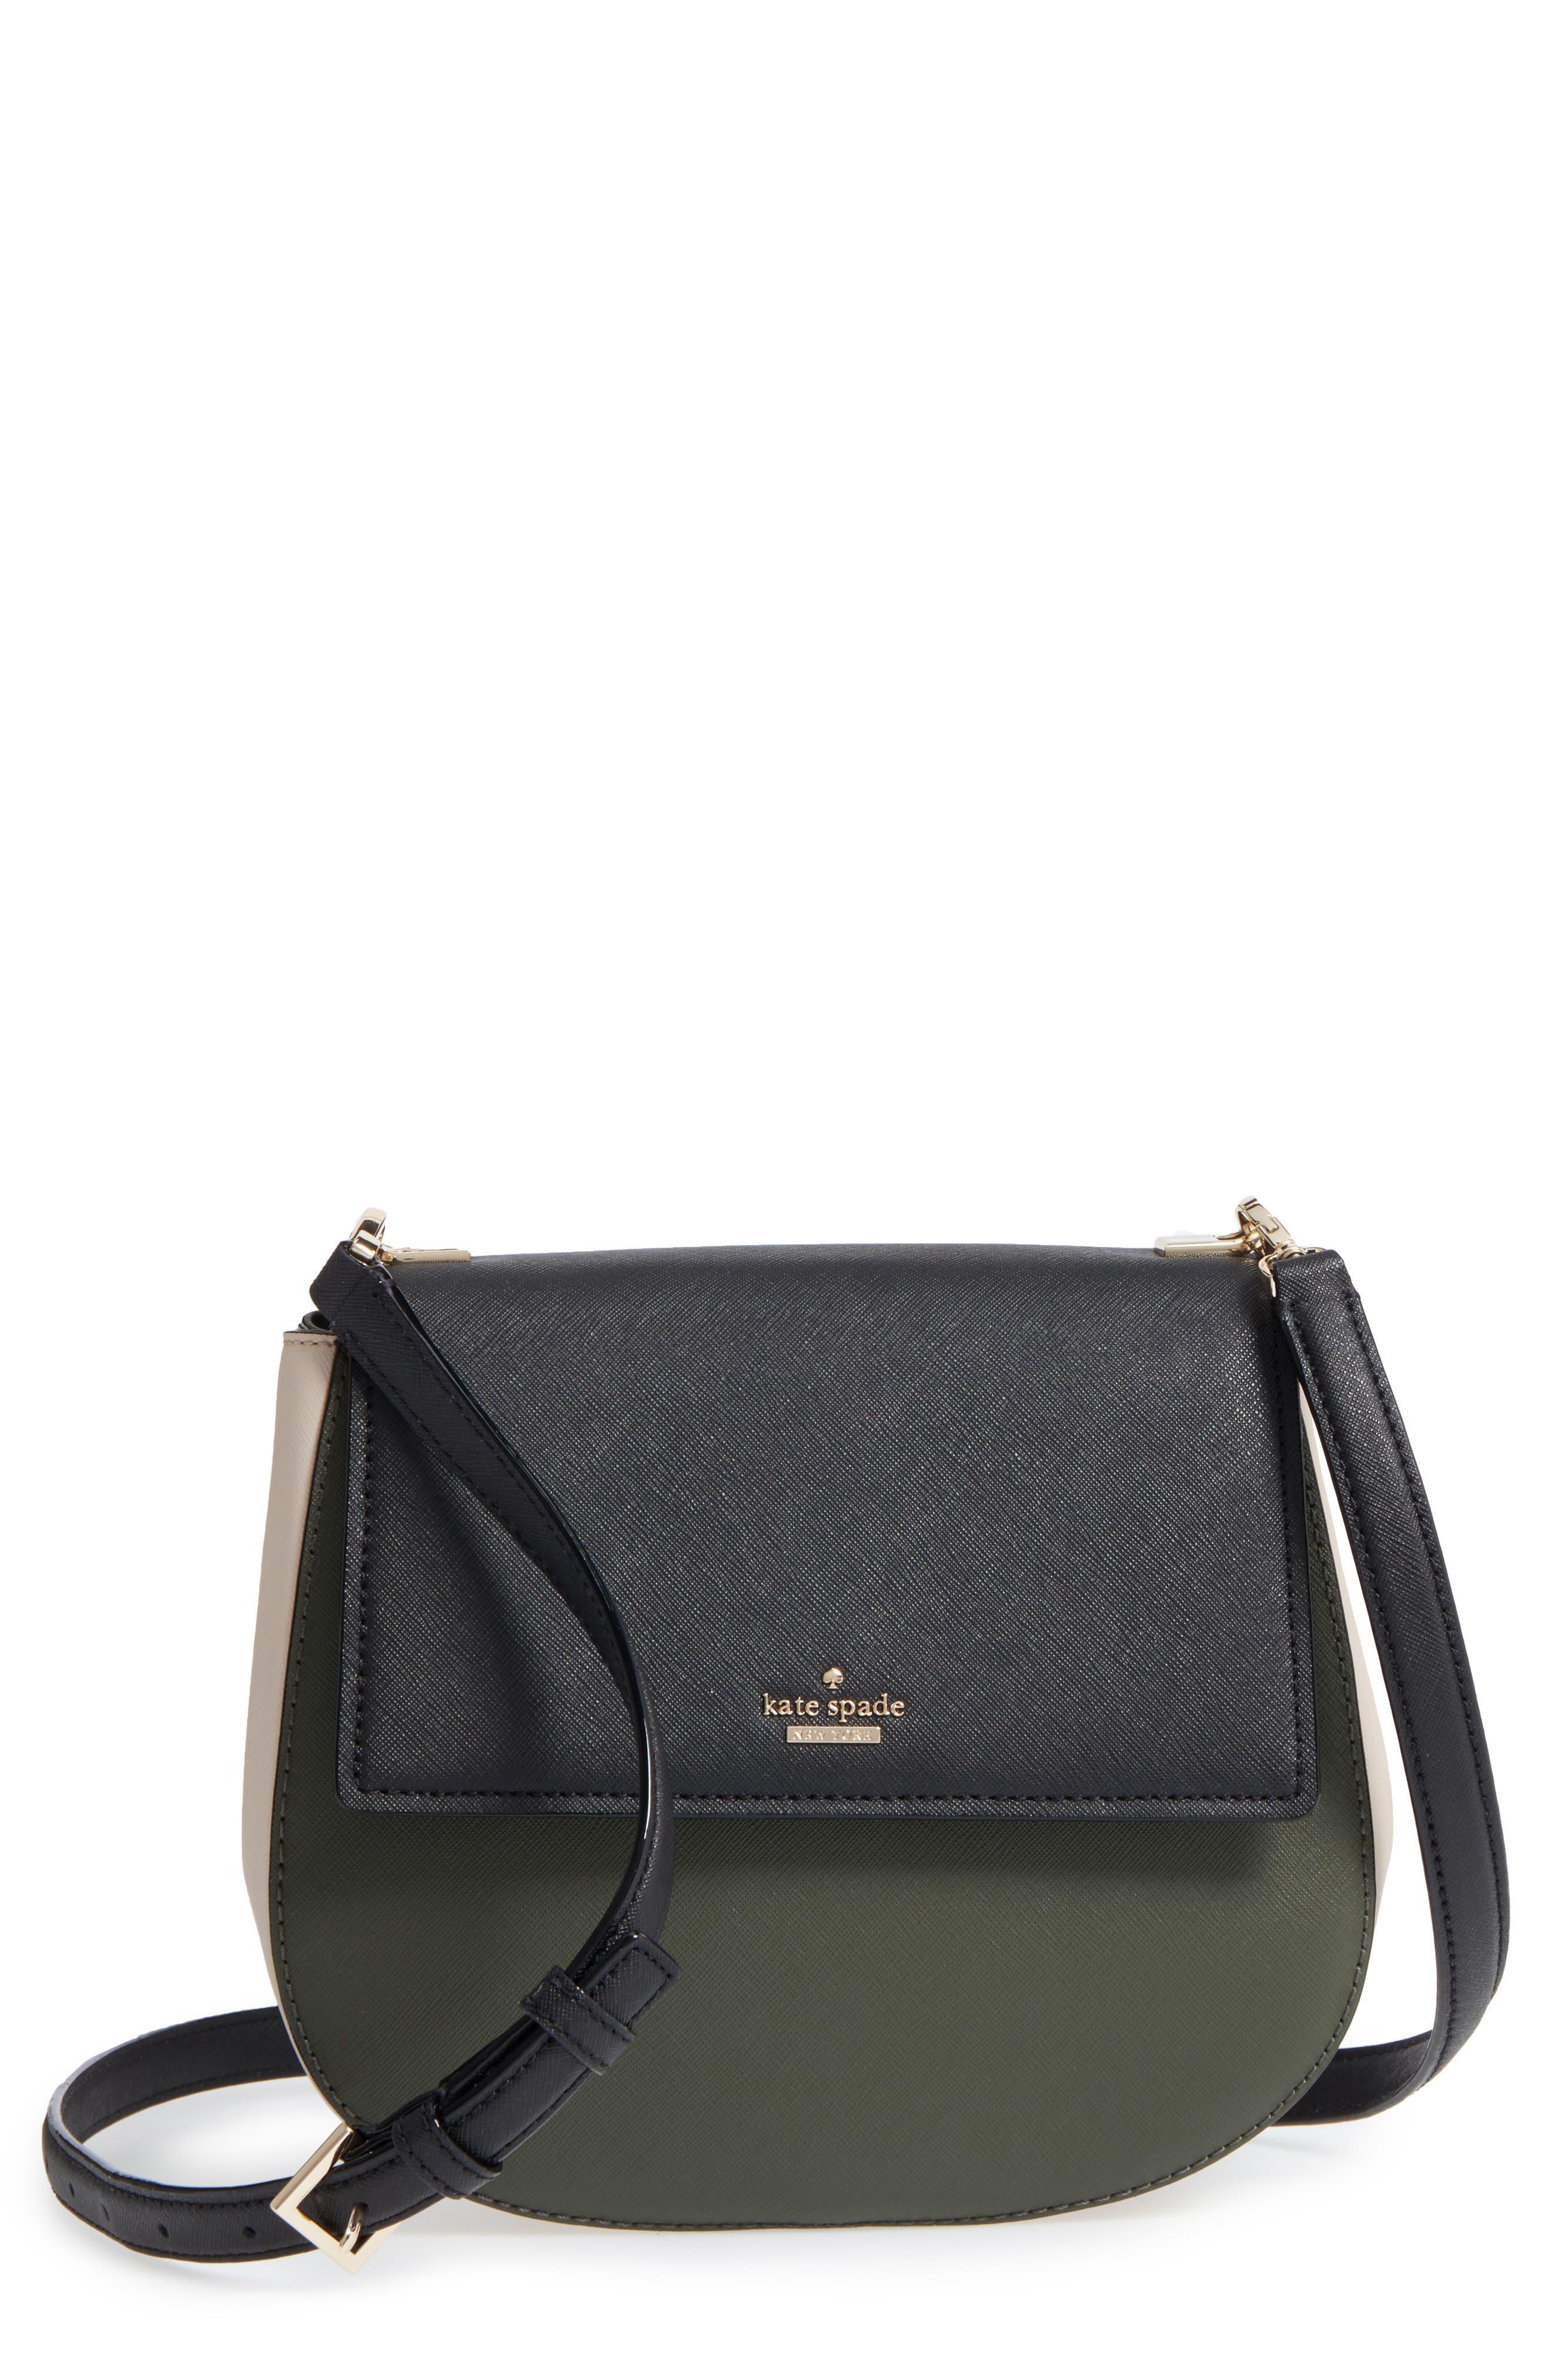 kate spade new york cameron street - byrdie leather crossbody bag